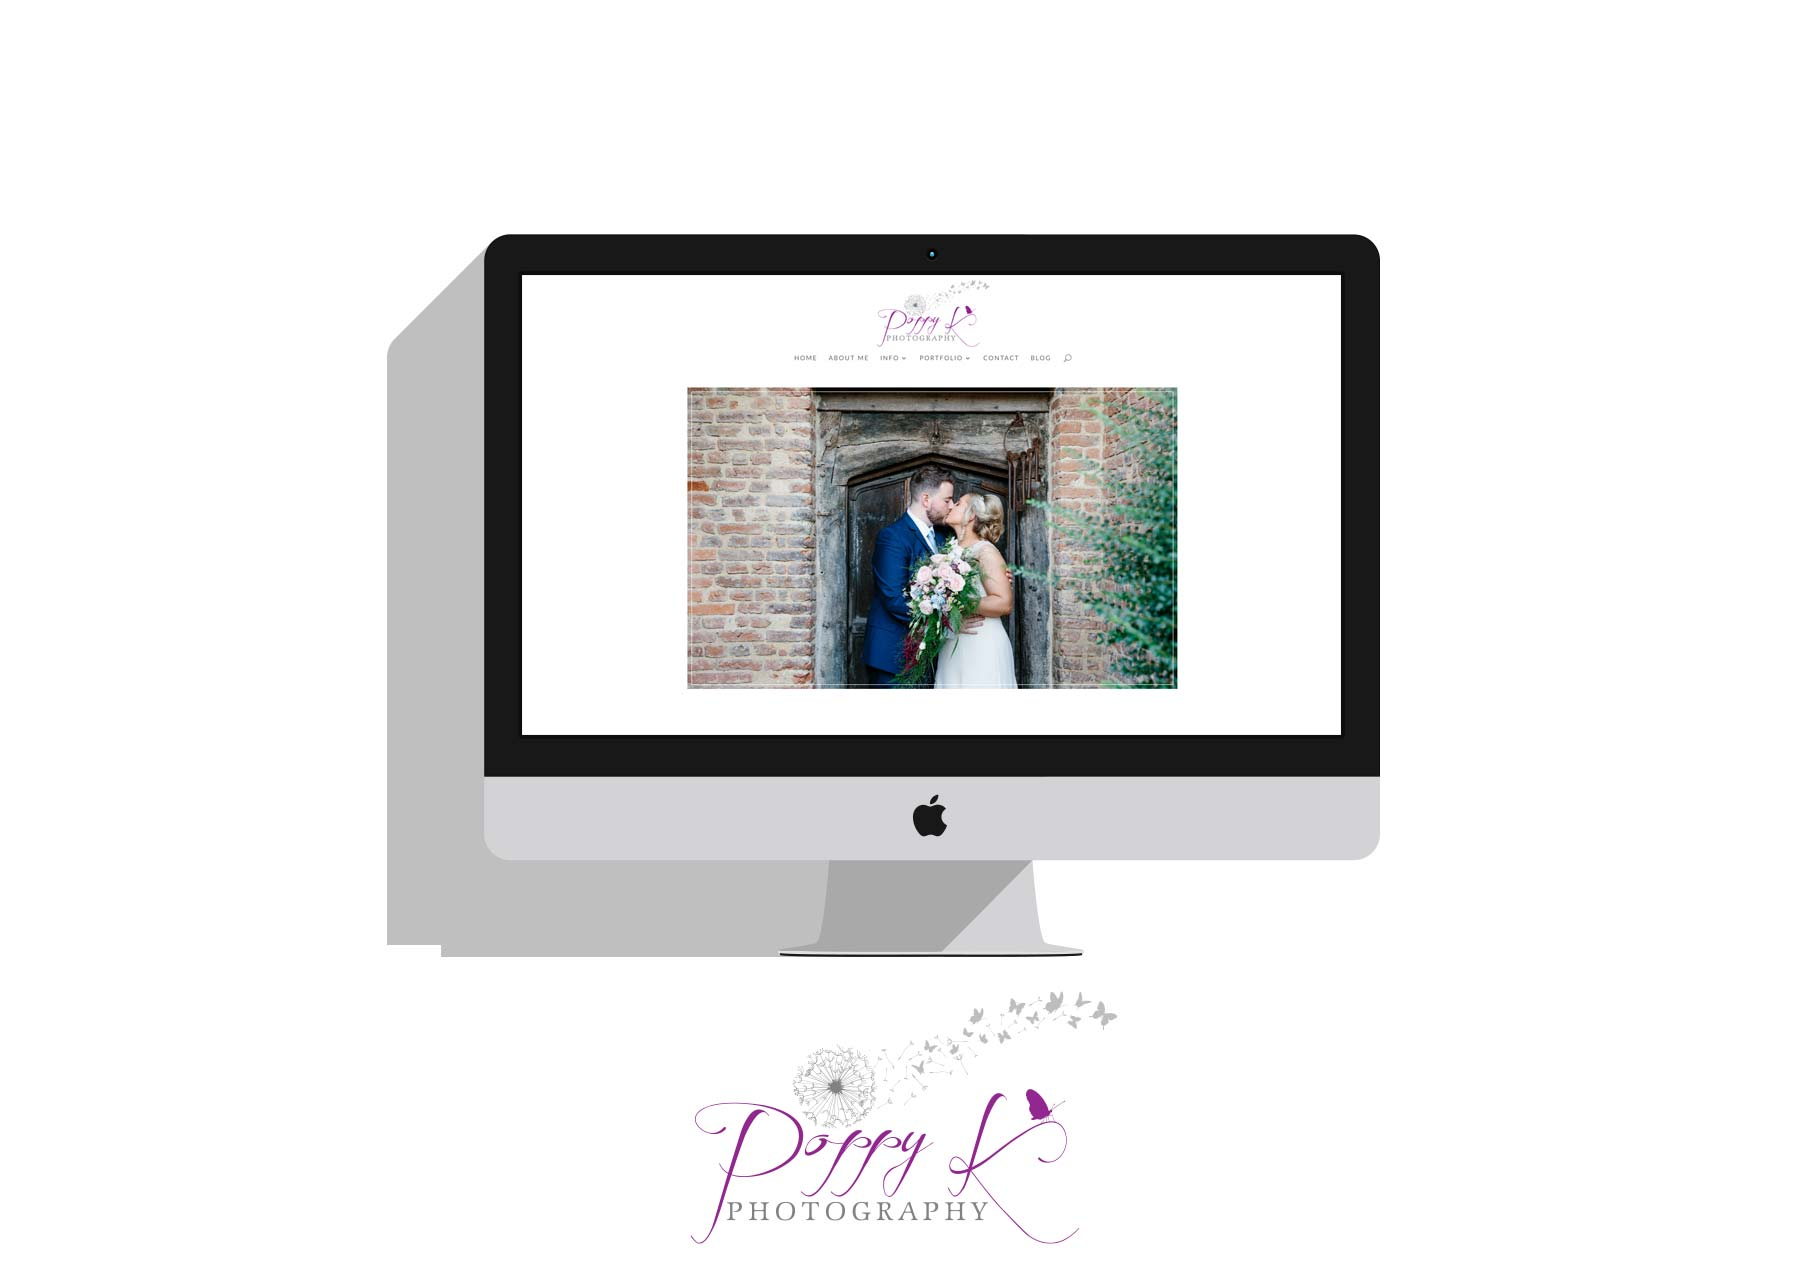 Mockup of Poppy K Photography website